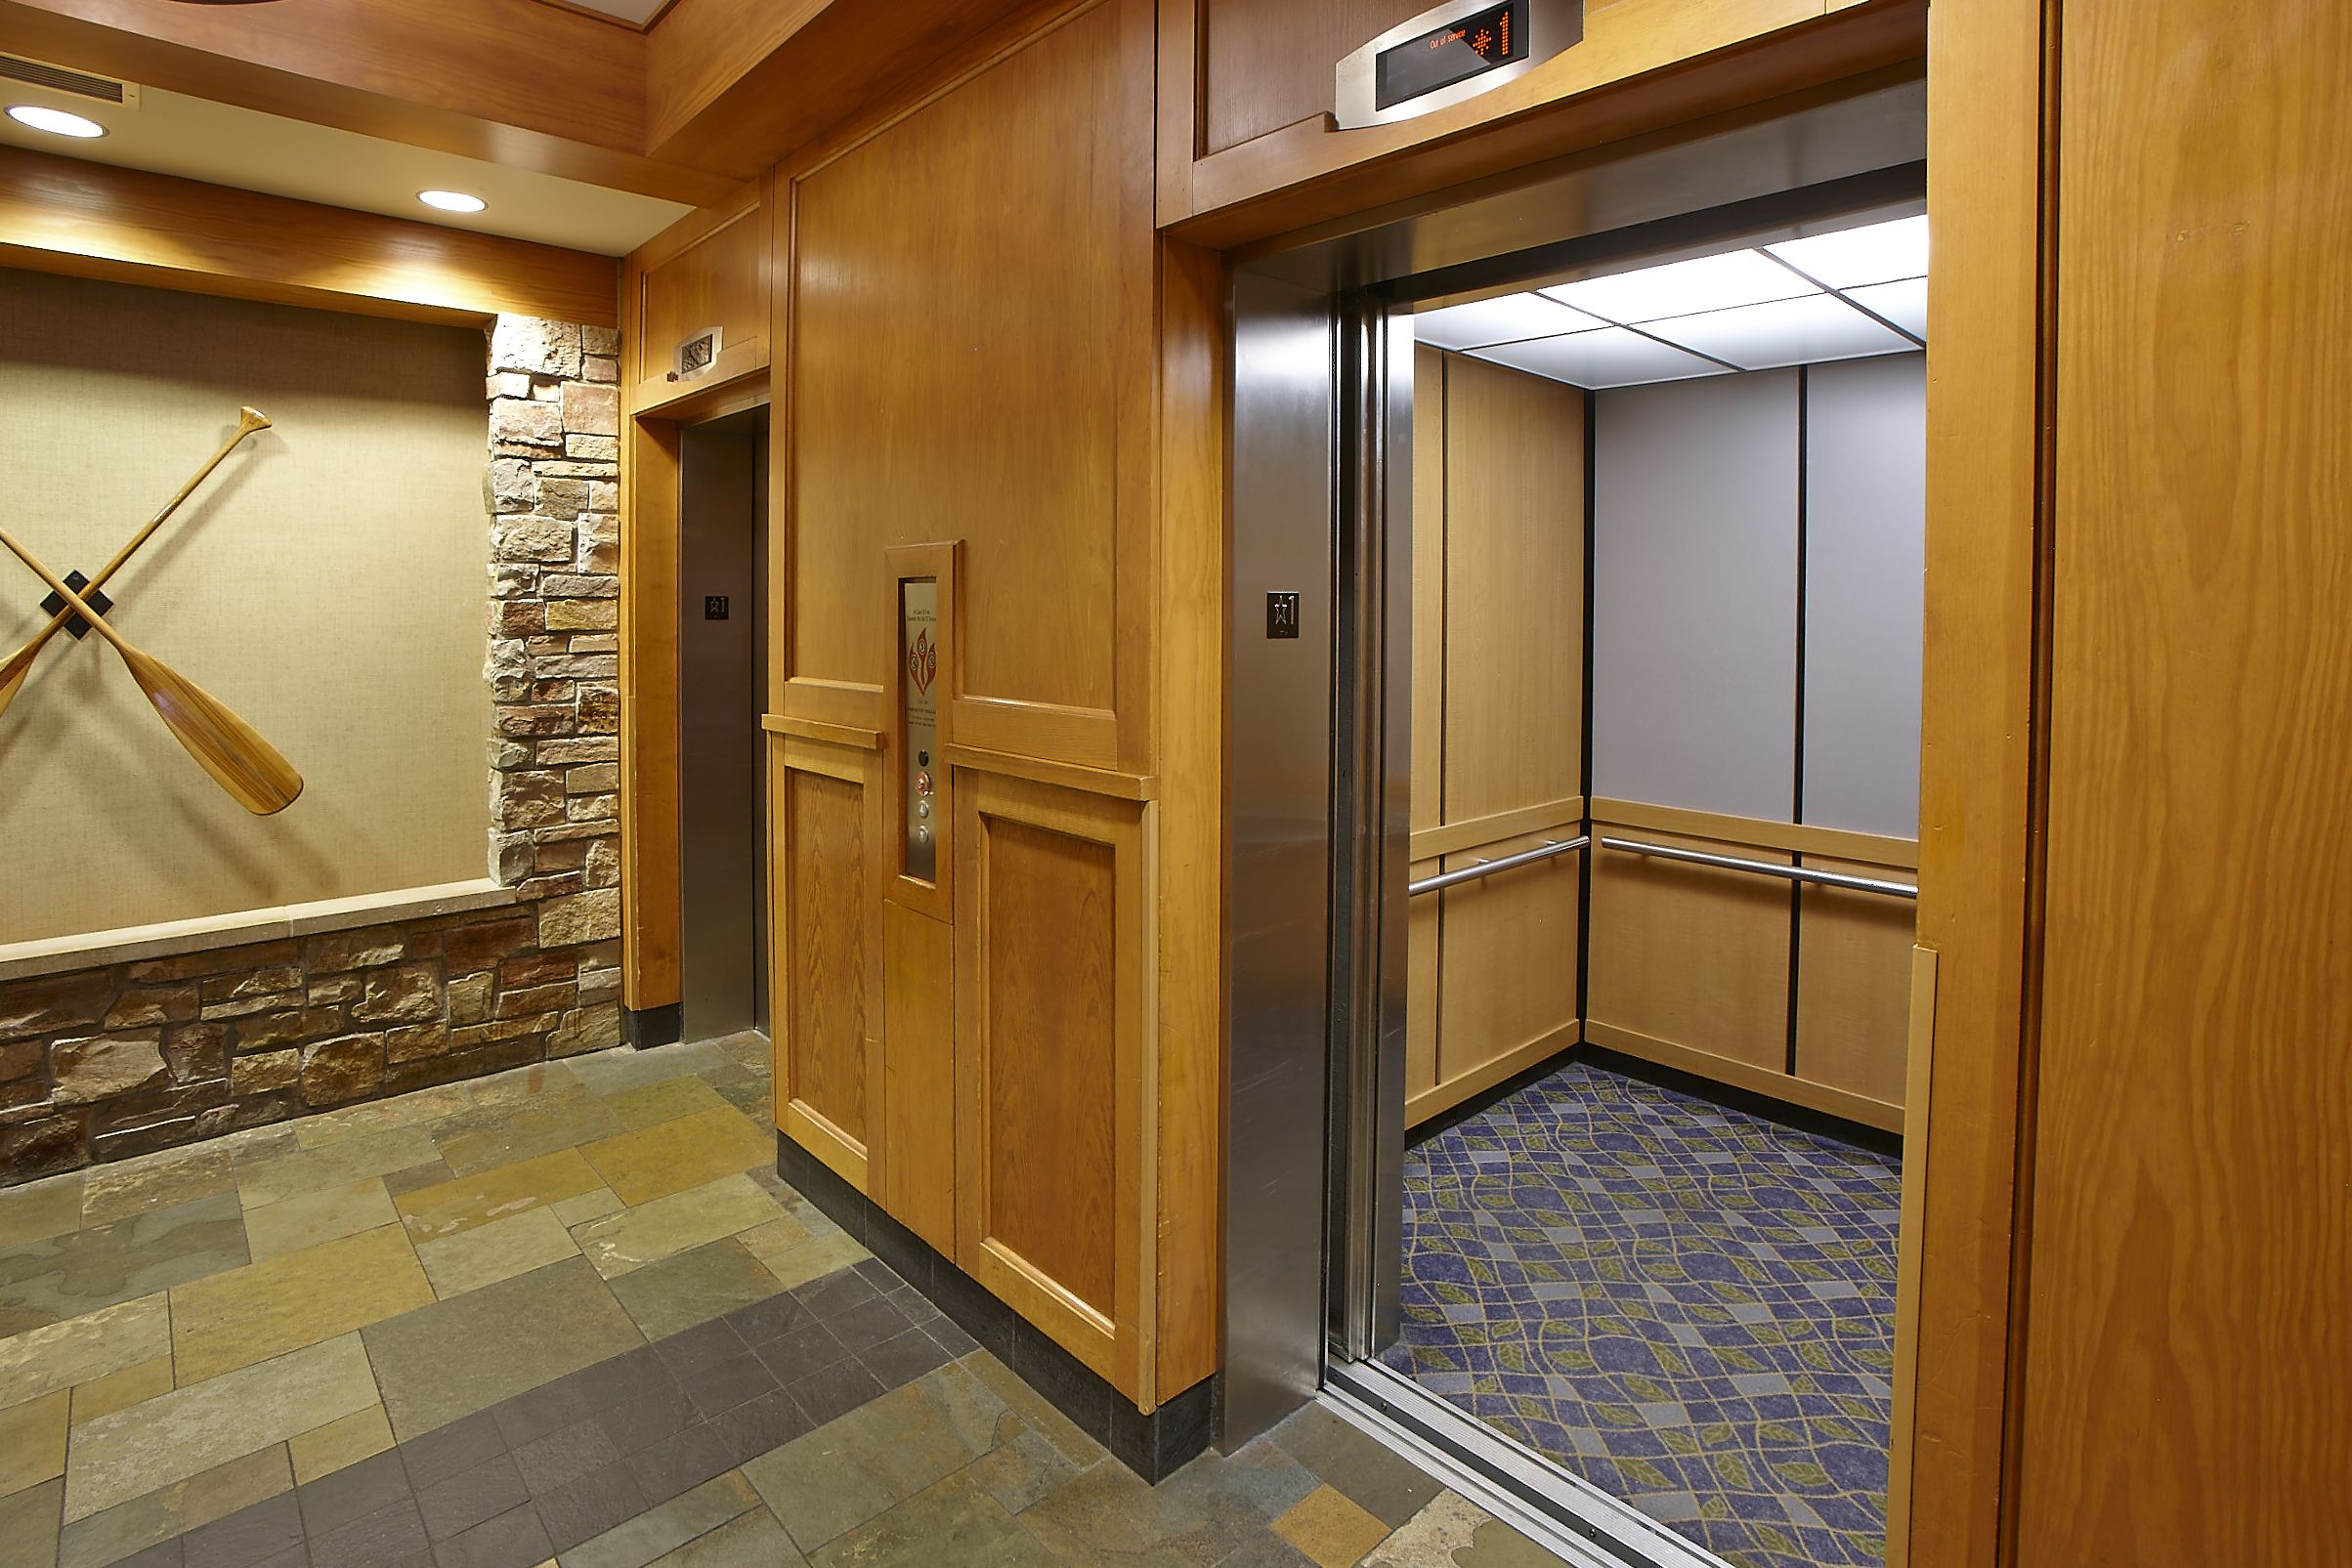 Radisson Hotel Bloomington Mn Elevator Interior Hospitality